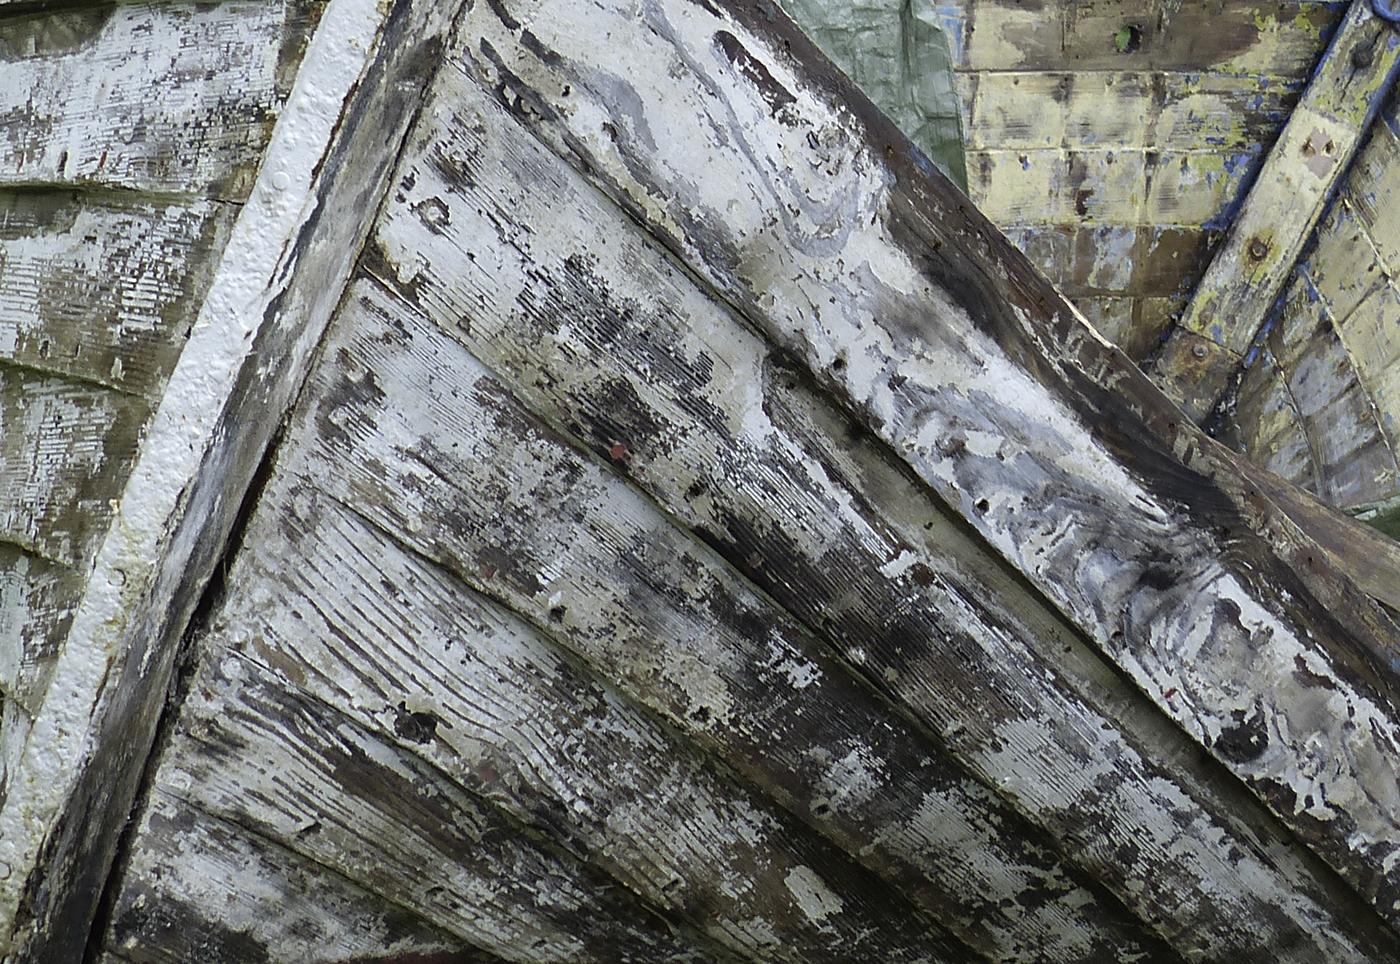 WHITBY BOAT by Jane Morrish.jpg